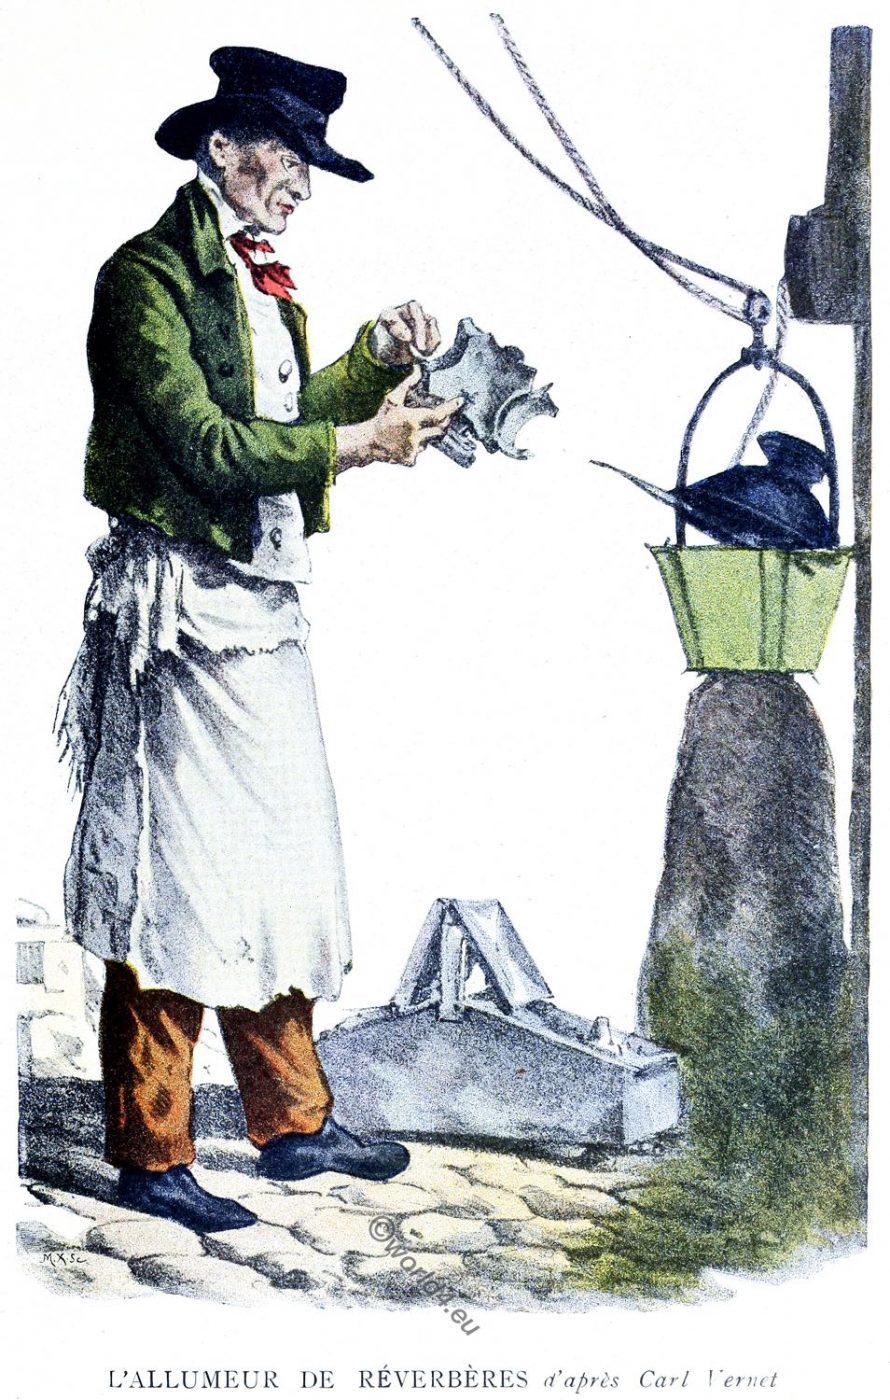 lantern lighter, carl, vernet, Parisian Characters, Historical professions,